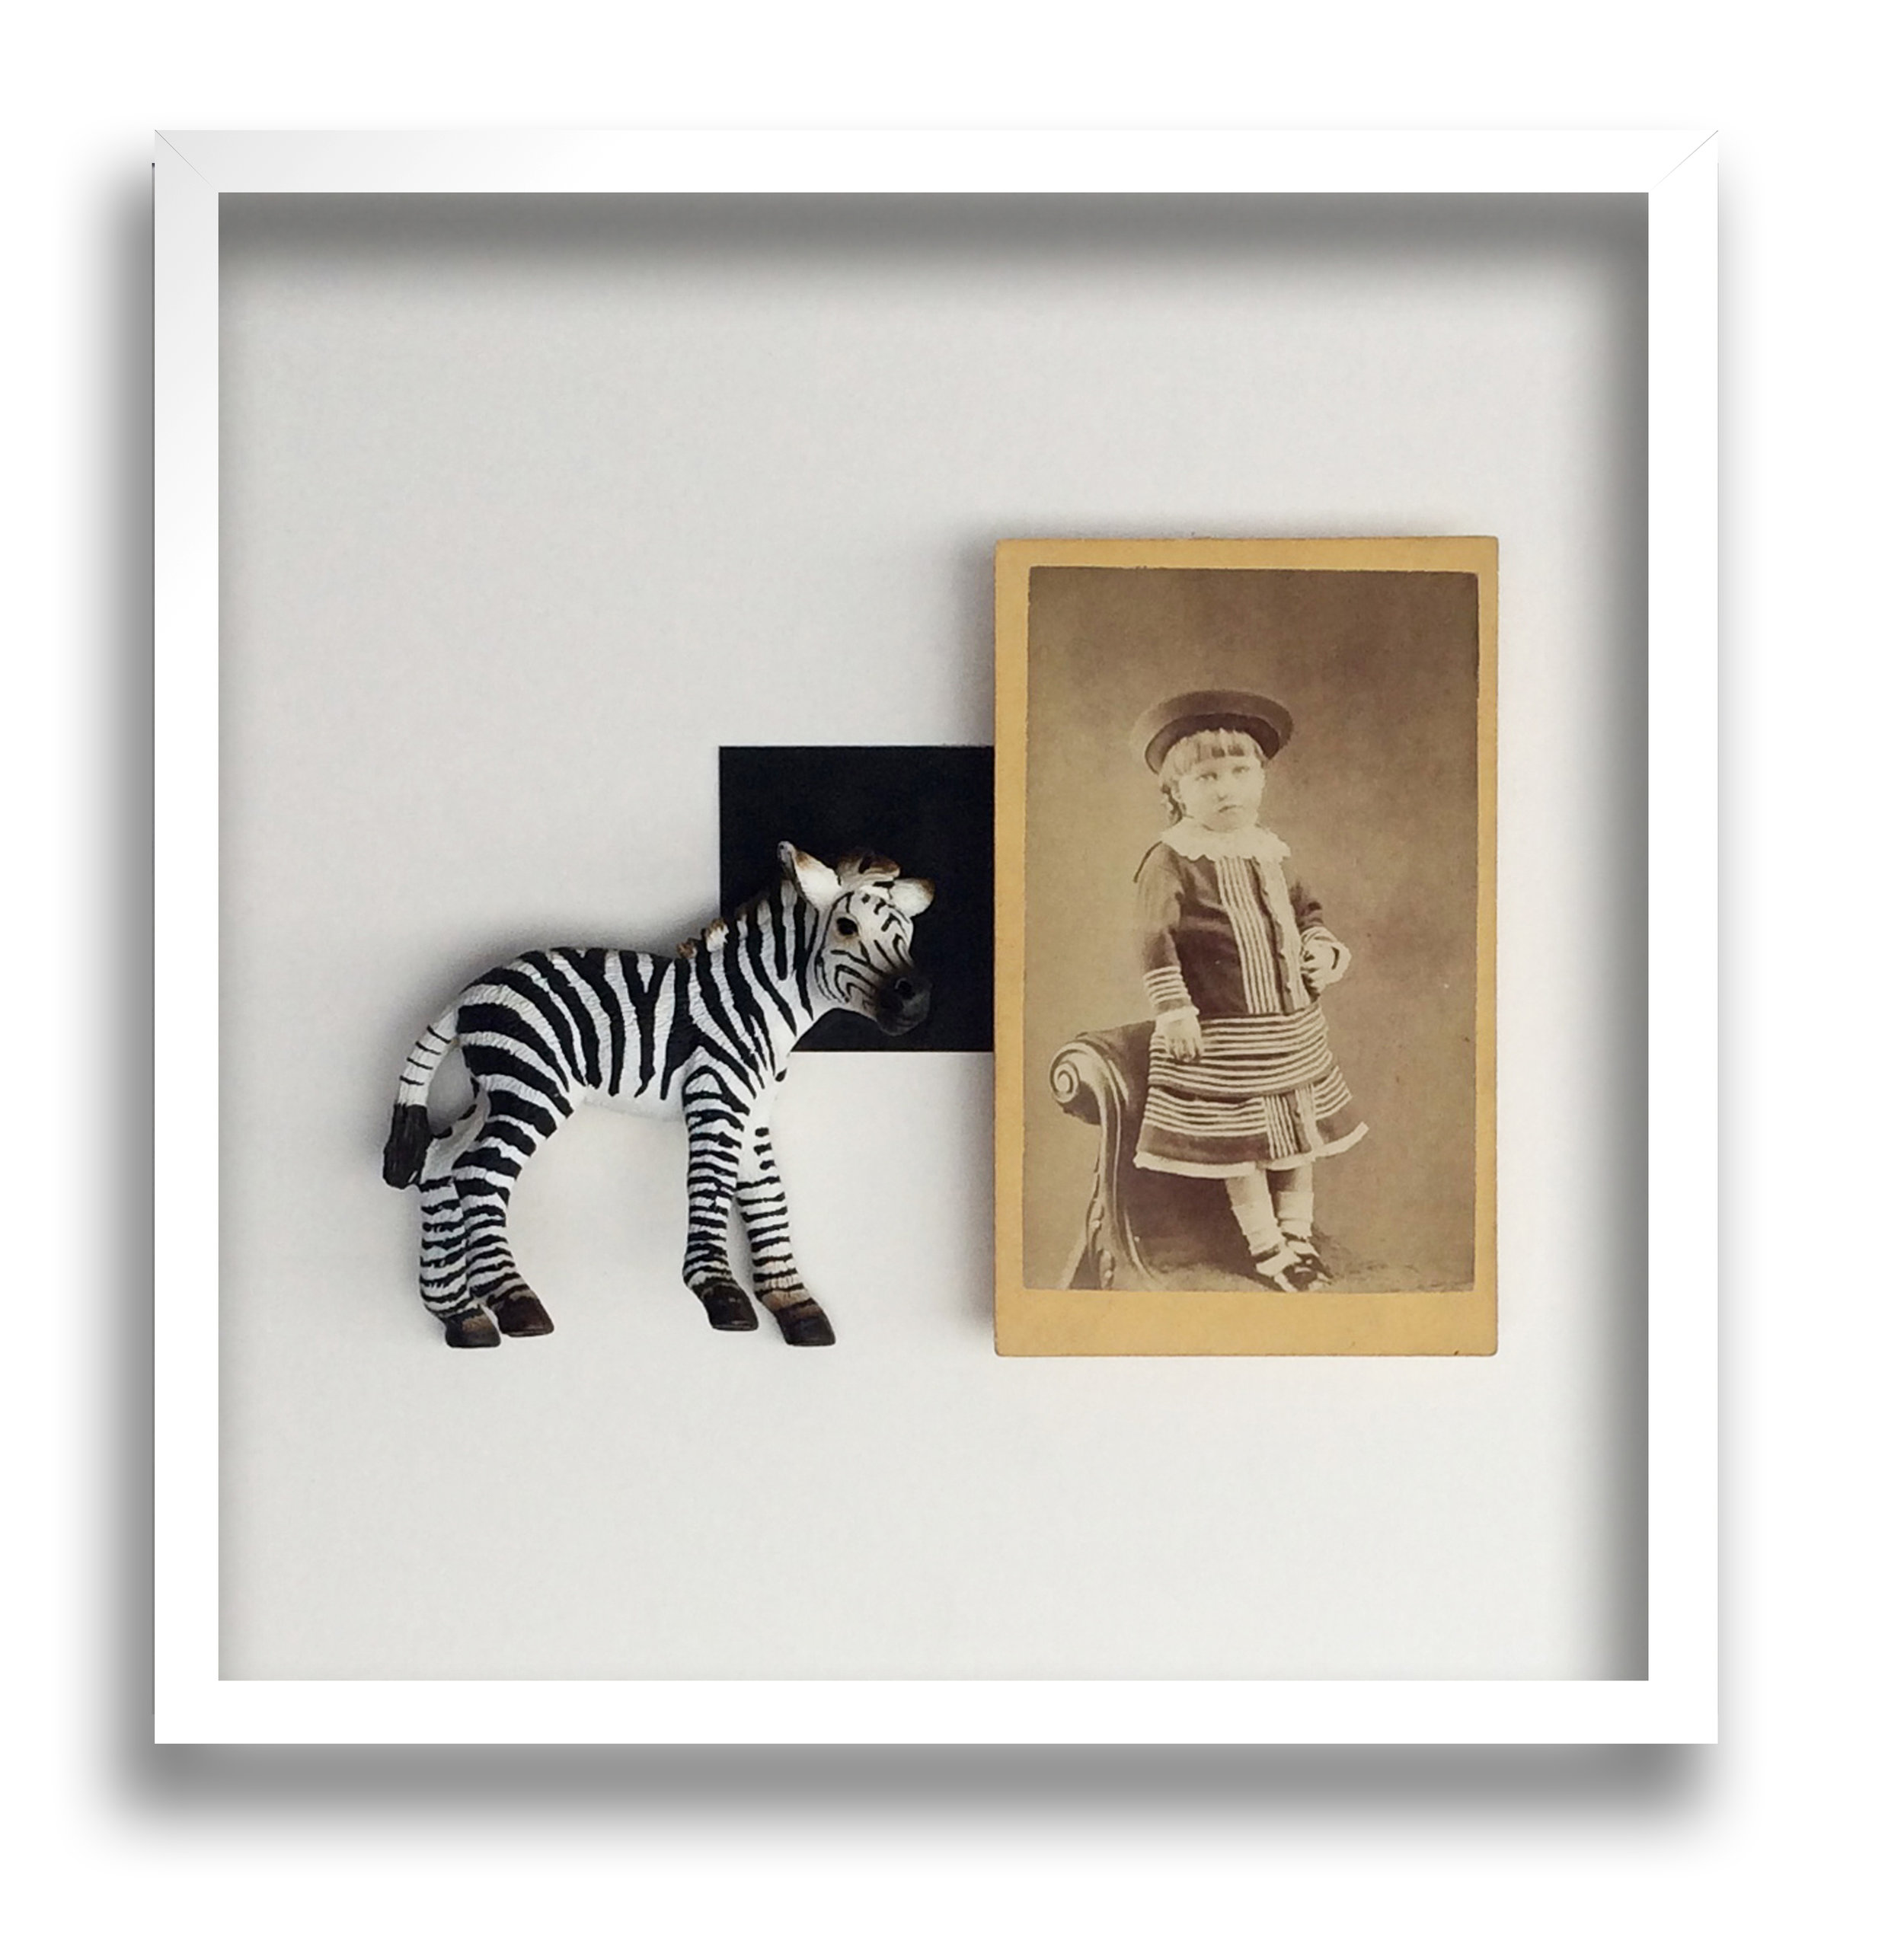 36. Galleria-l'Affiche_Alfred-Drago-Rens_Isabelle-ha-sempre-amato-le-righe_2016_30x30cm.jpg